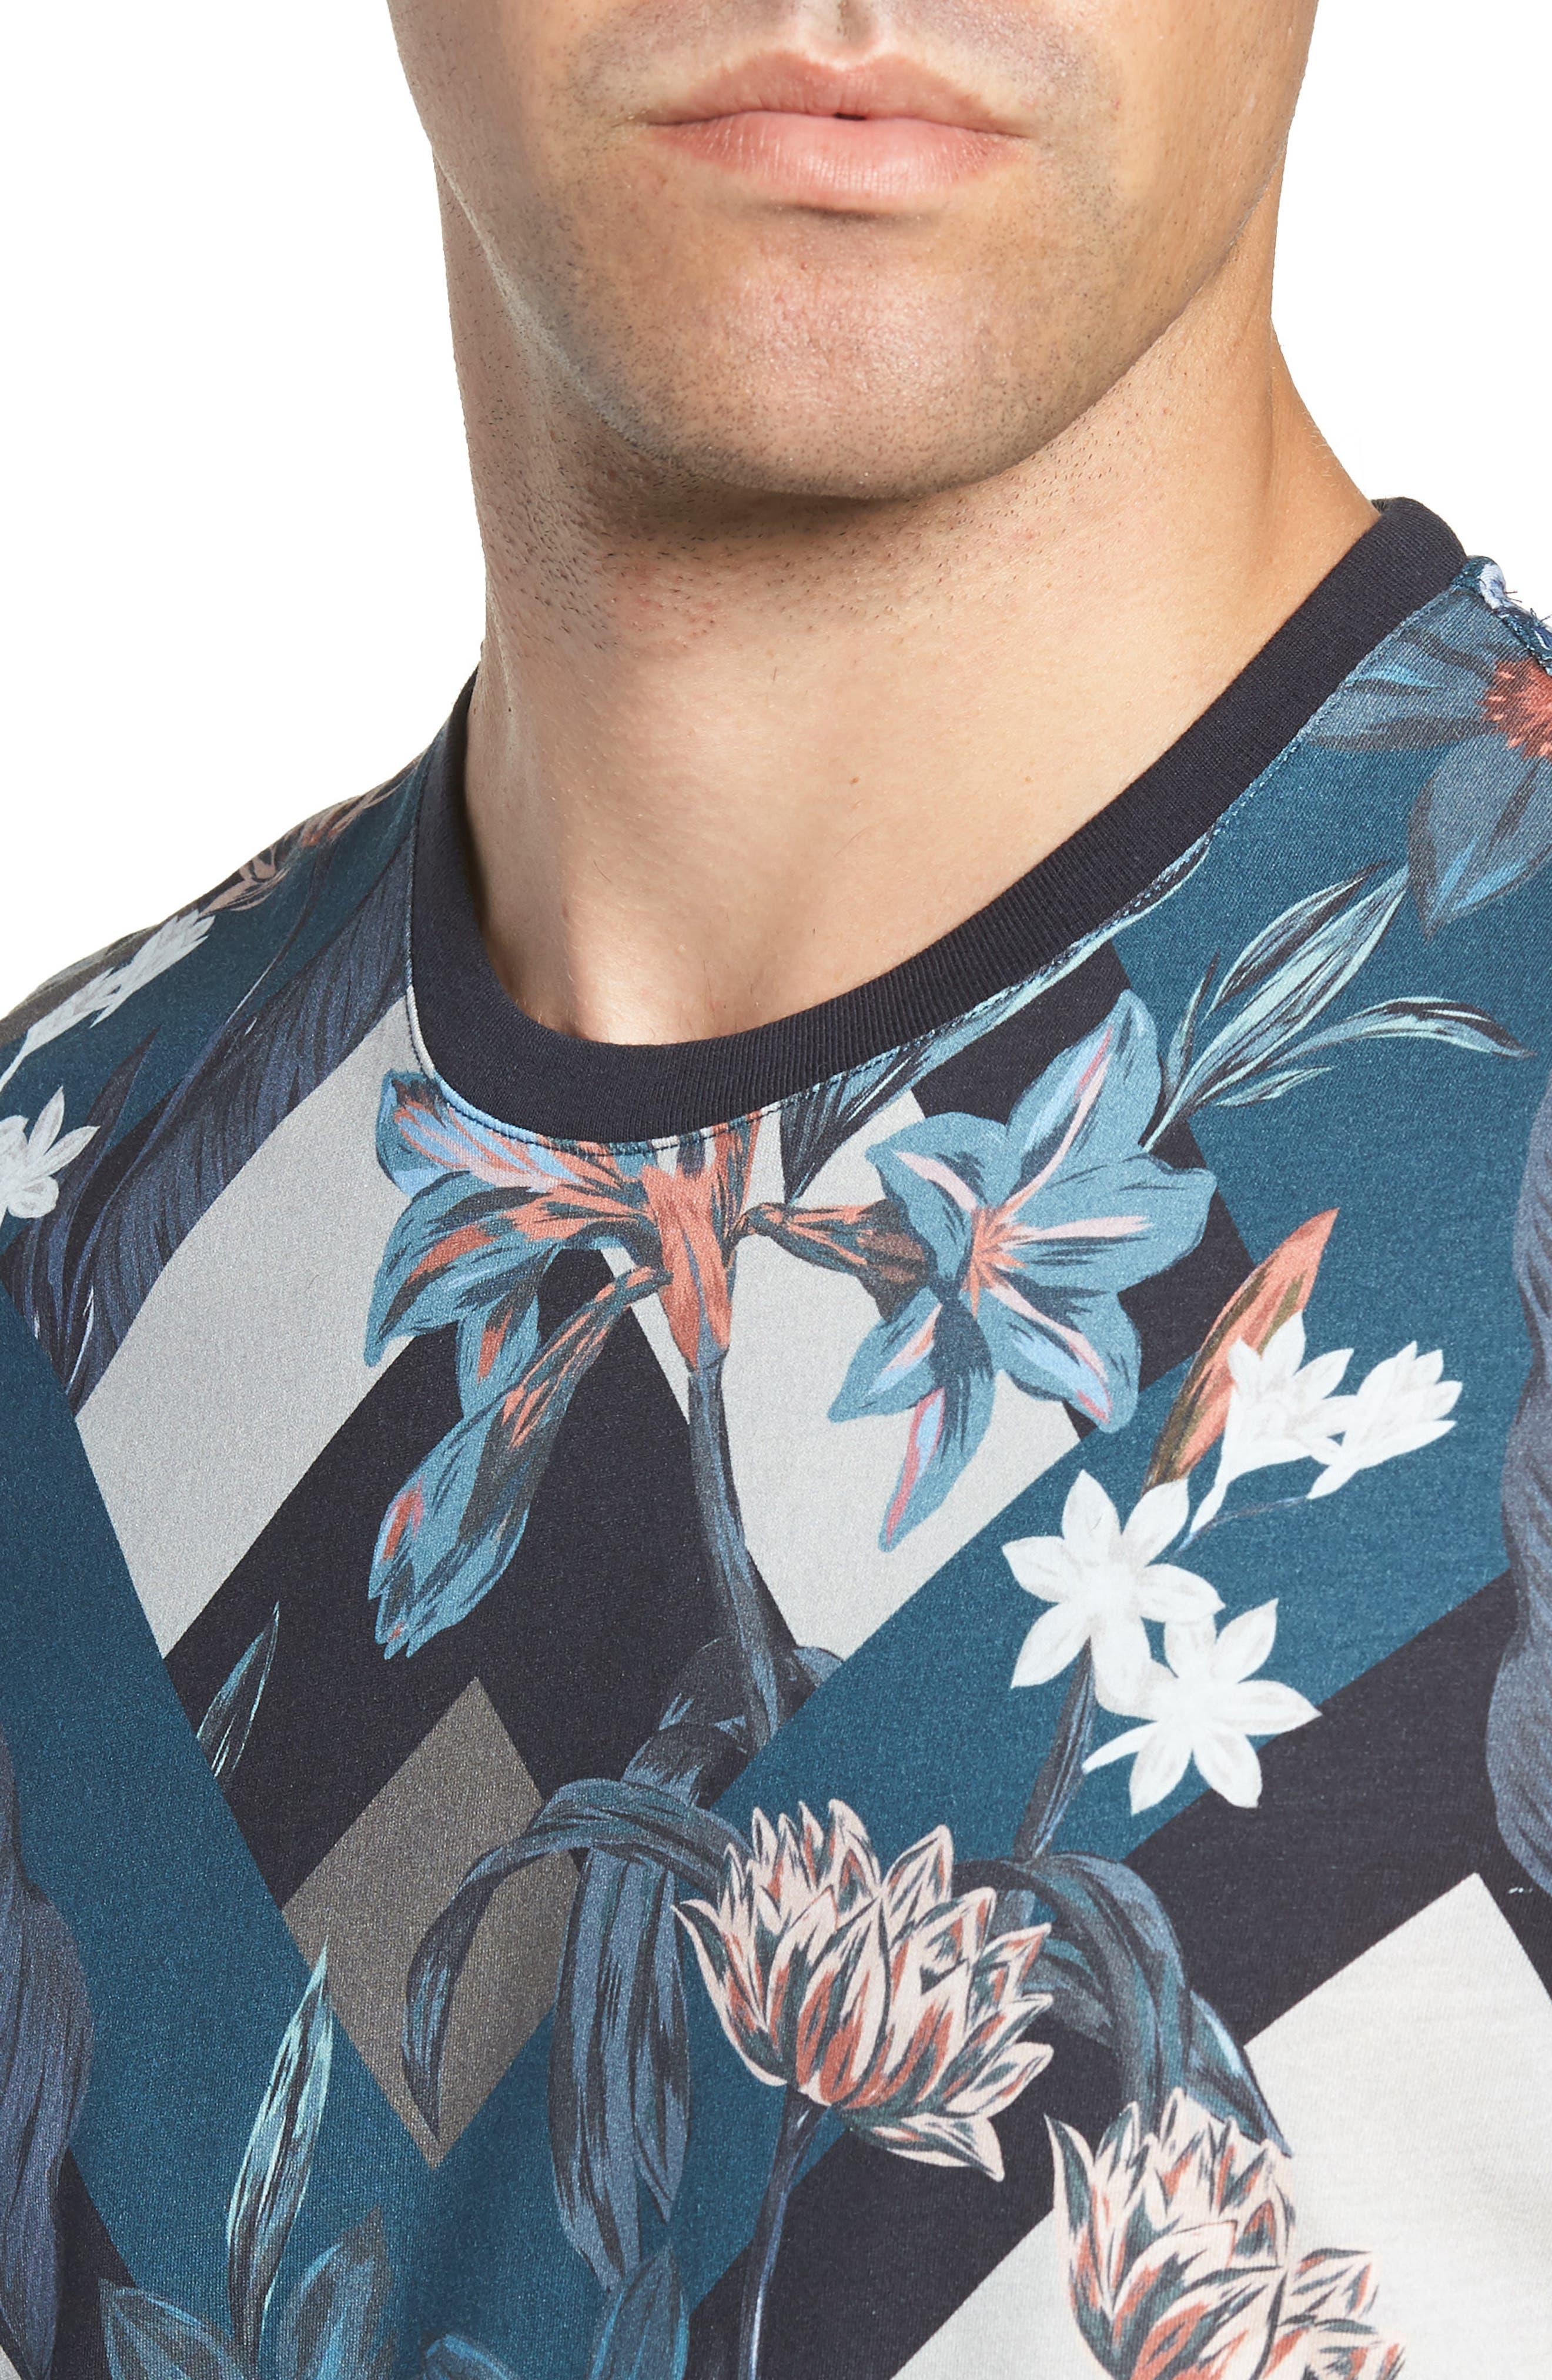 Jolly Slim Fit T-Shirt,                             Alternate thumbnail 4, color,                             410